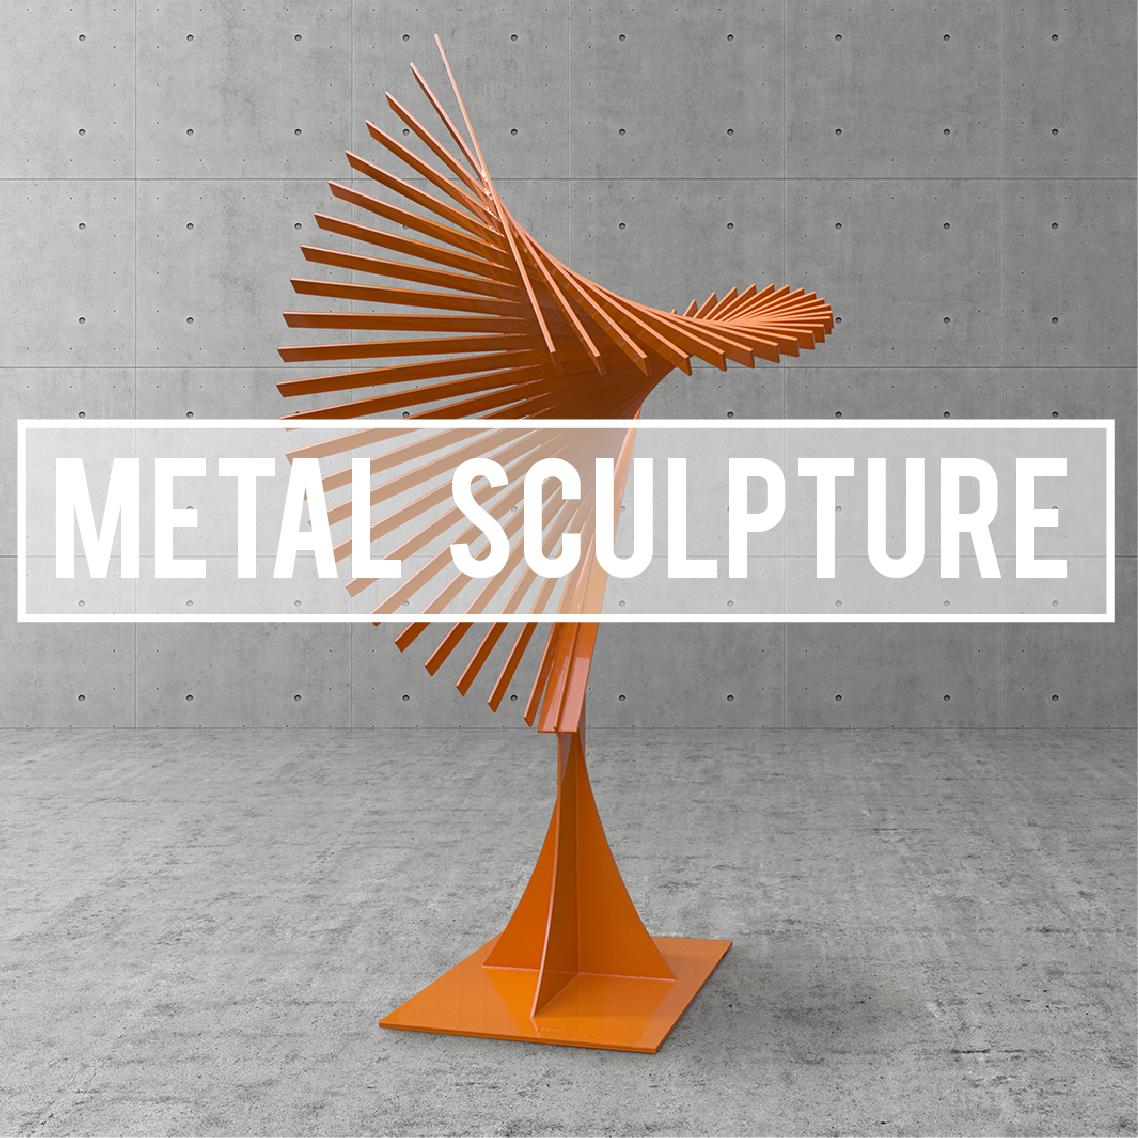 metal sculpture cover-01.jpg